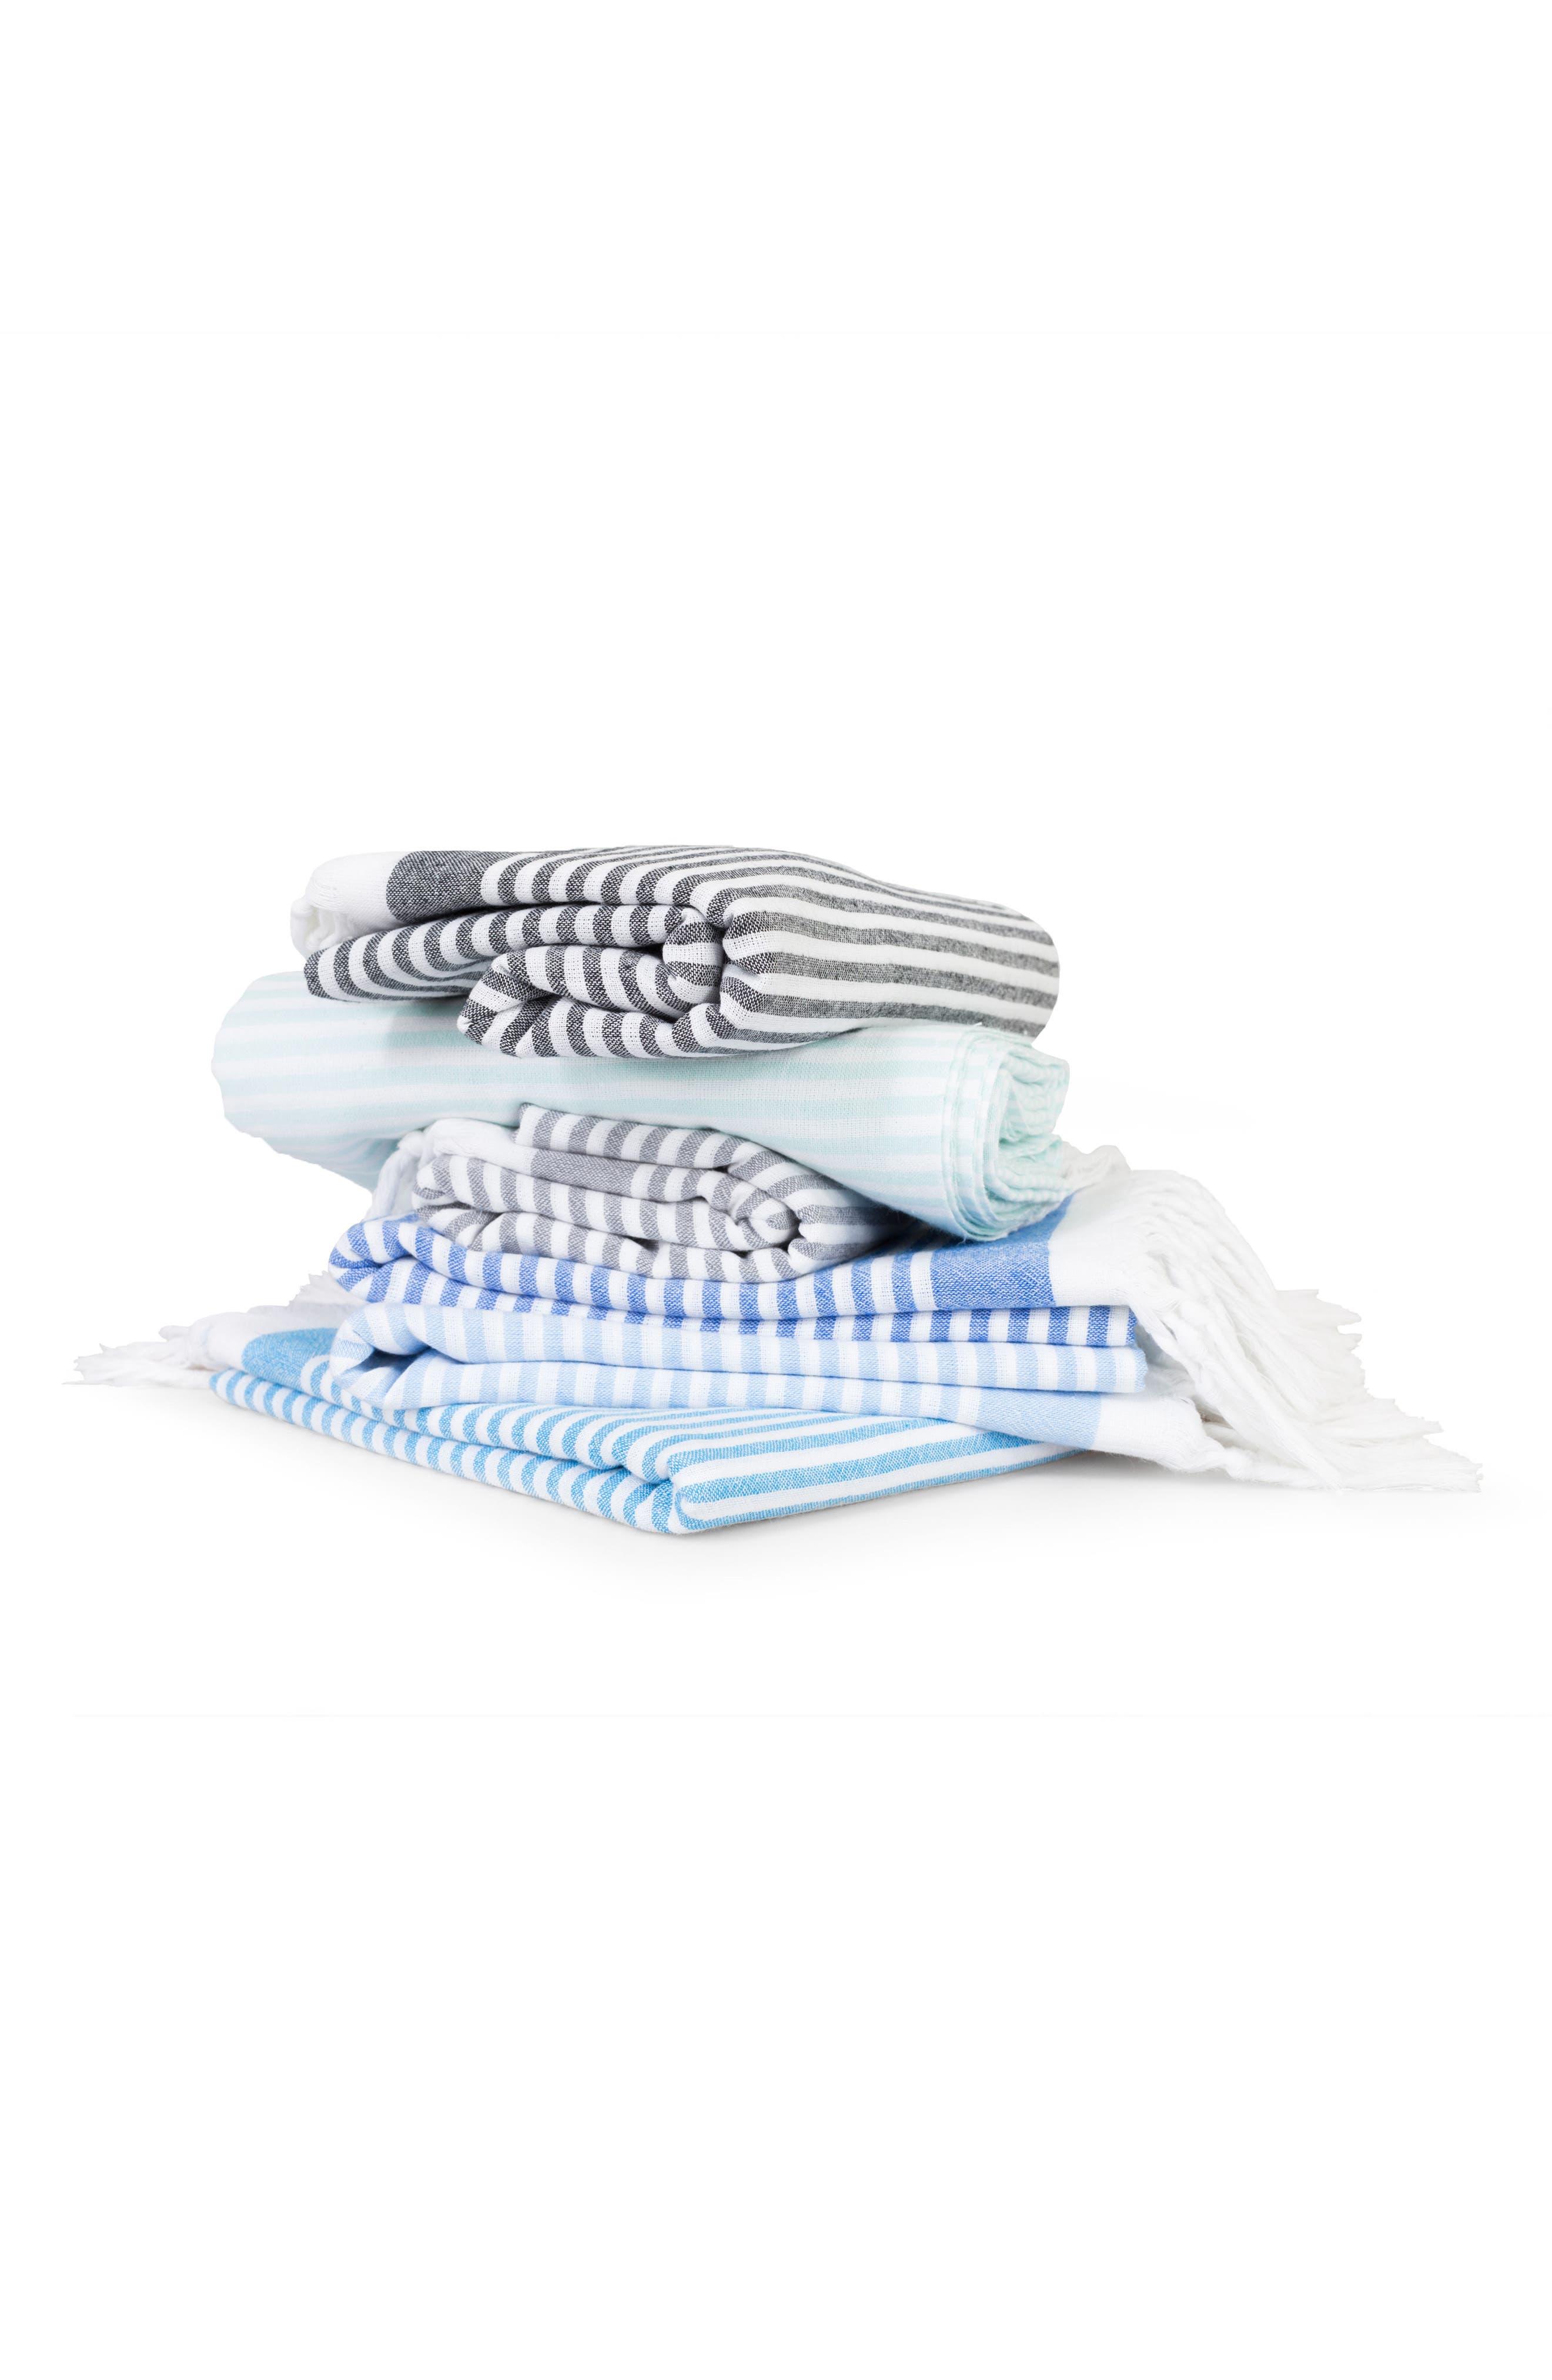 Soft Stripes Turkish Pestemal Towel,                             Alternate thumbnail 3, color,                             BLACK